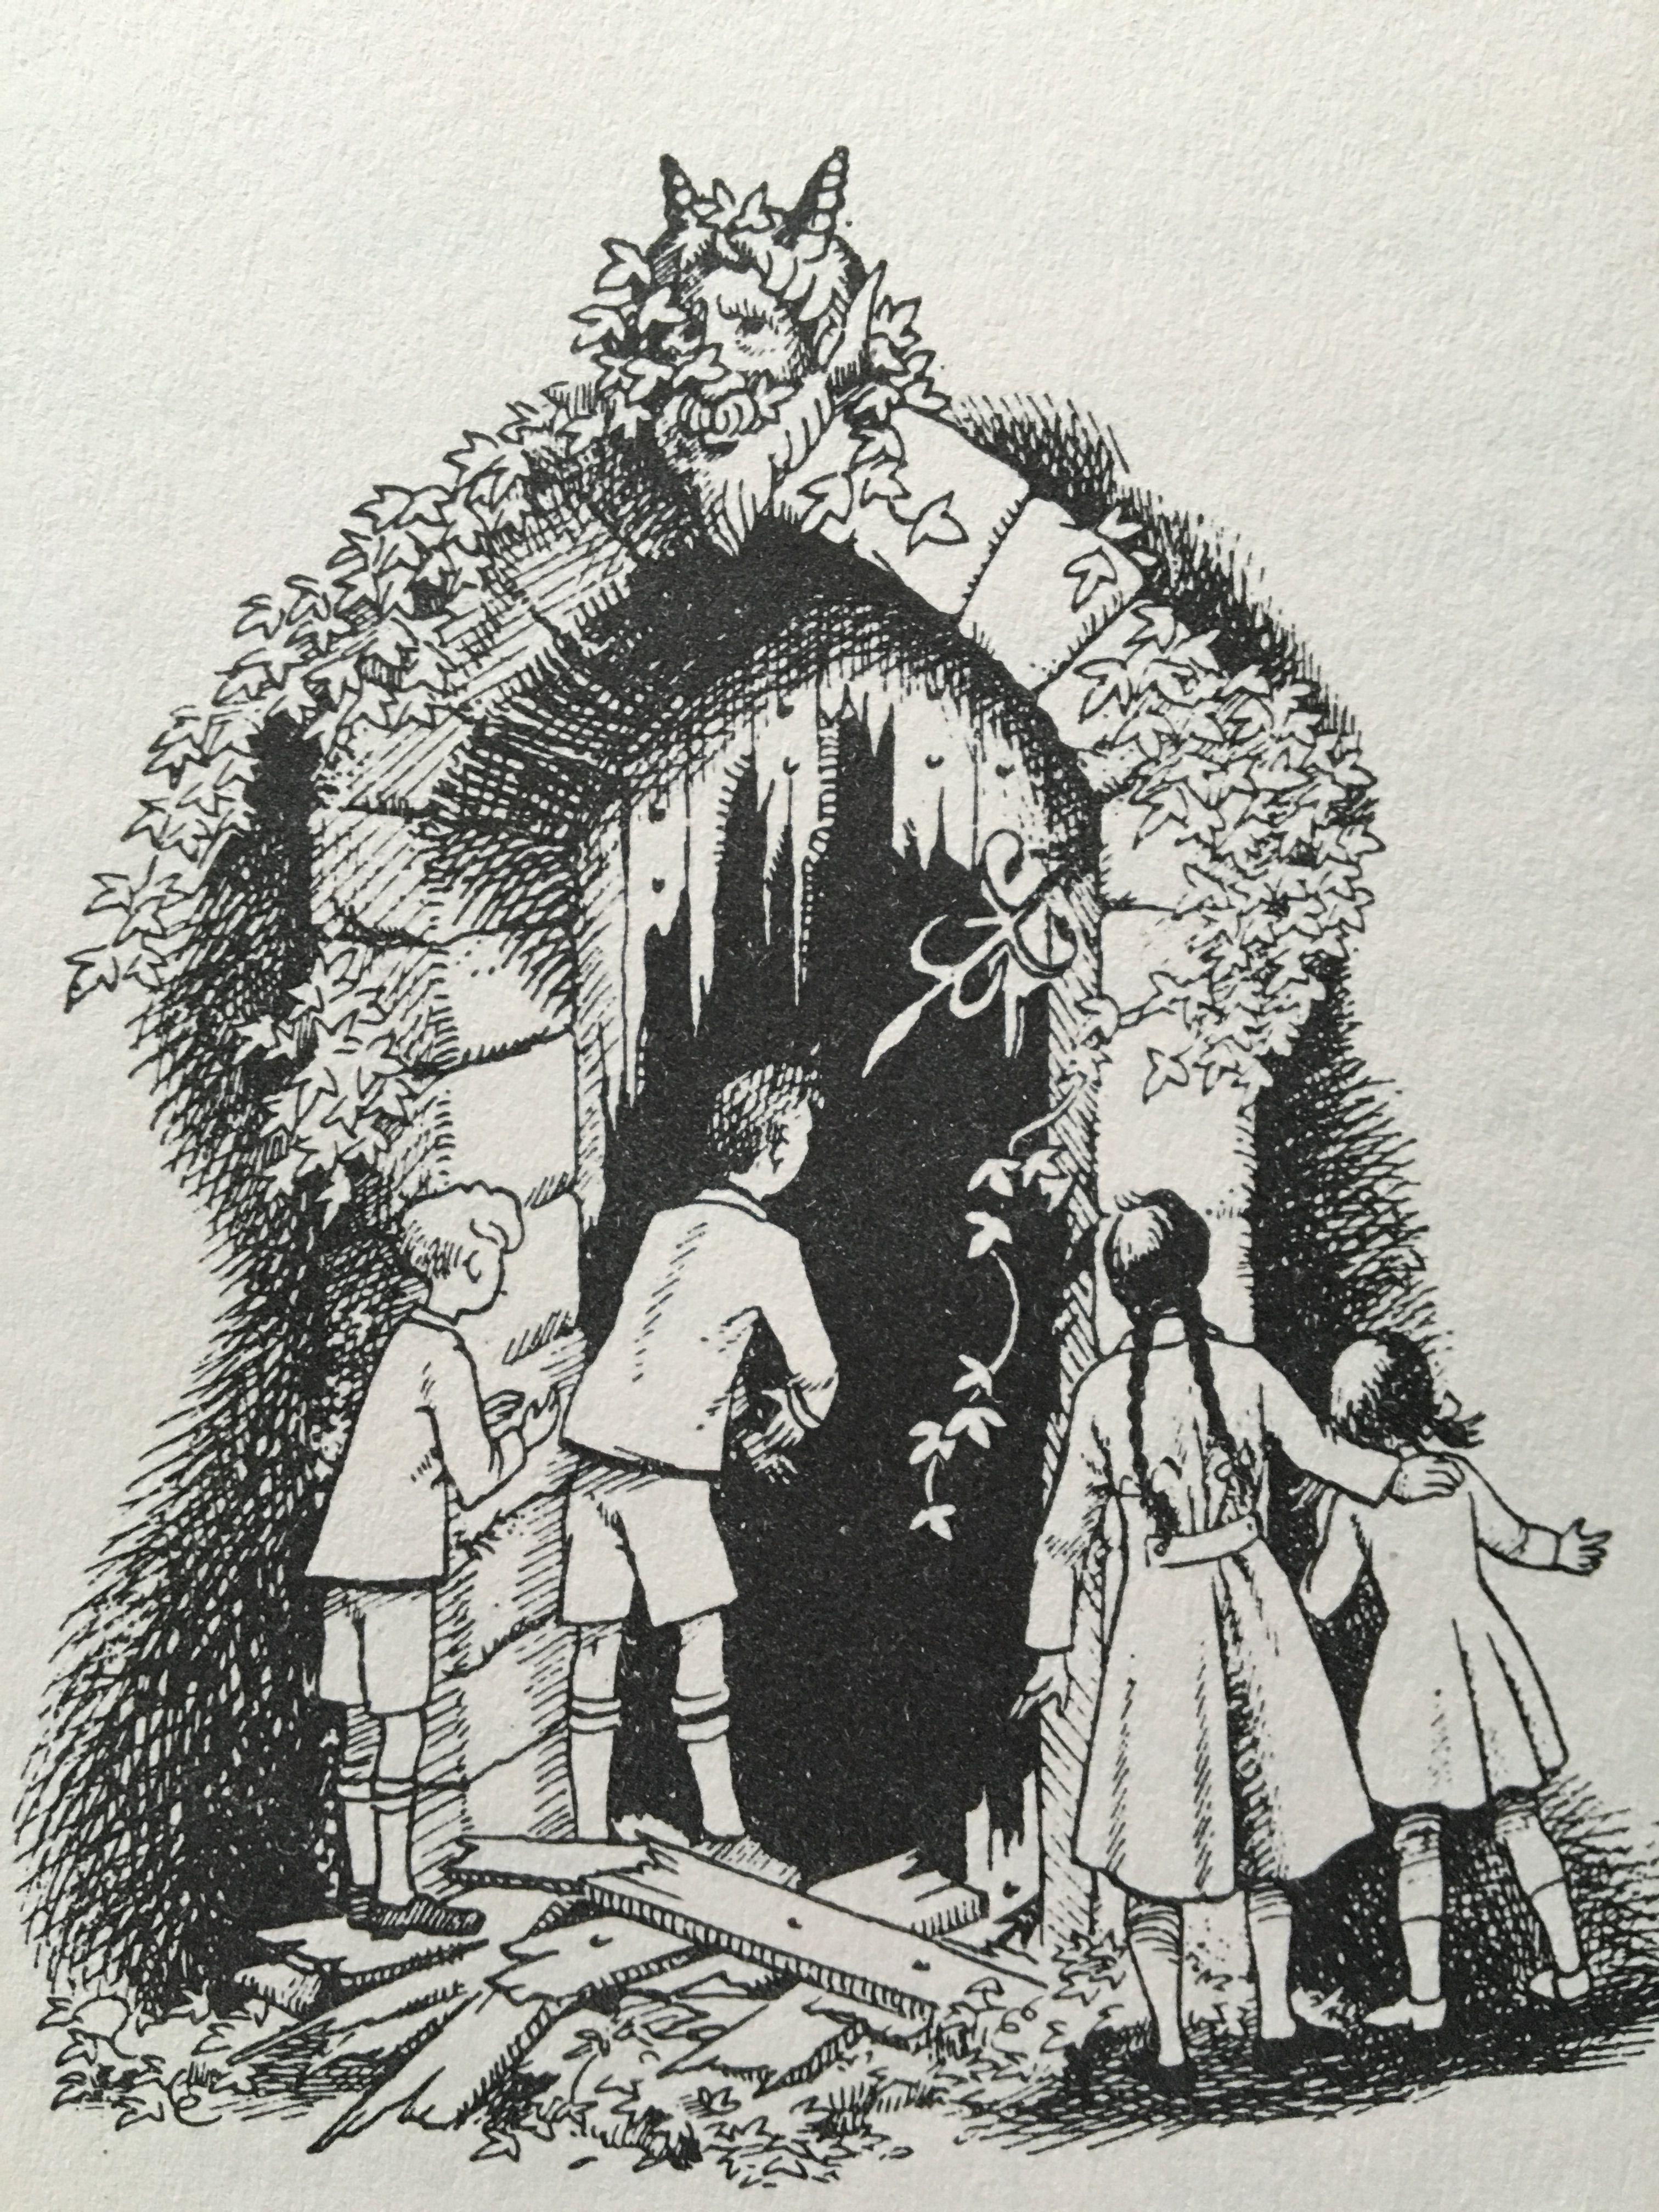 Pauline Baynes illustration from \'Prince Caspian\' | C S Lewis ...